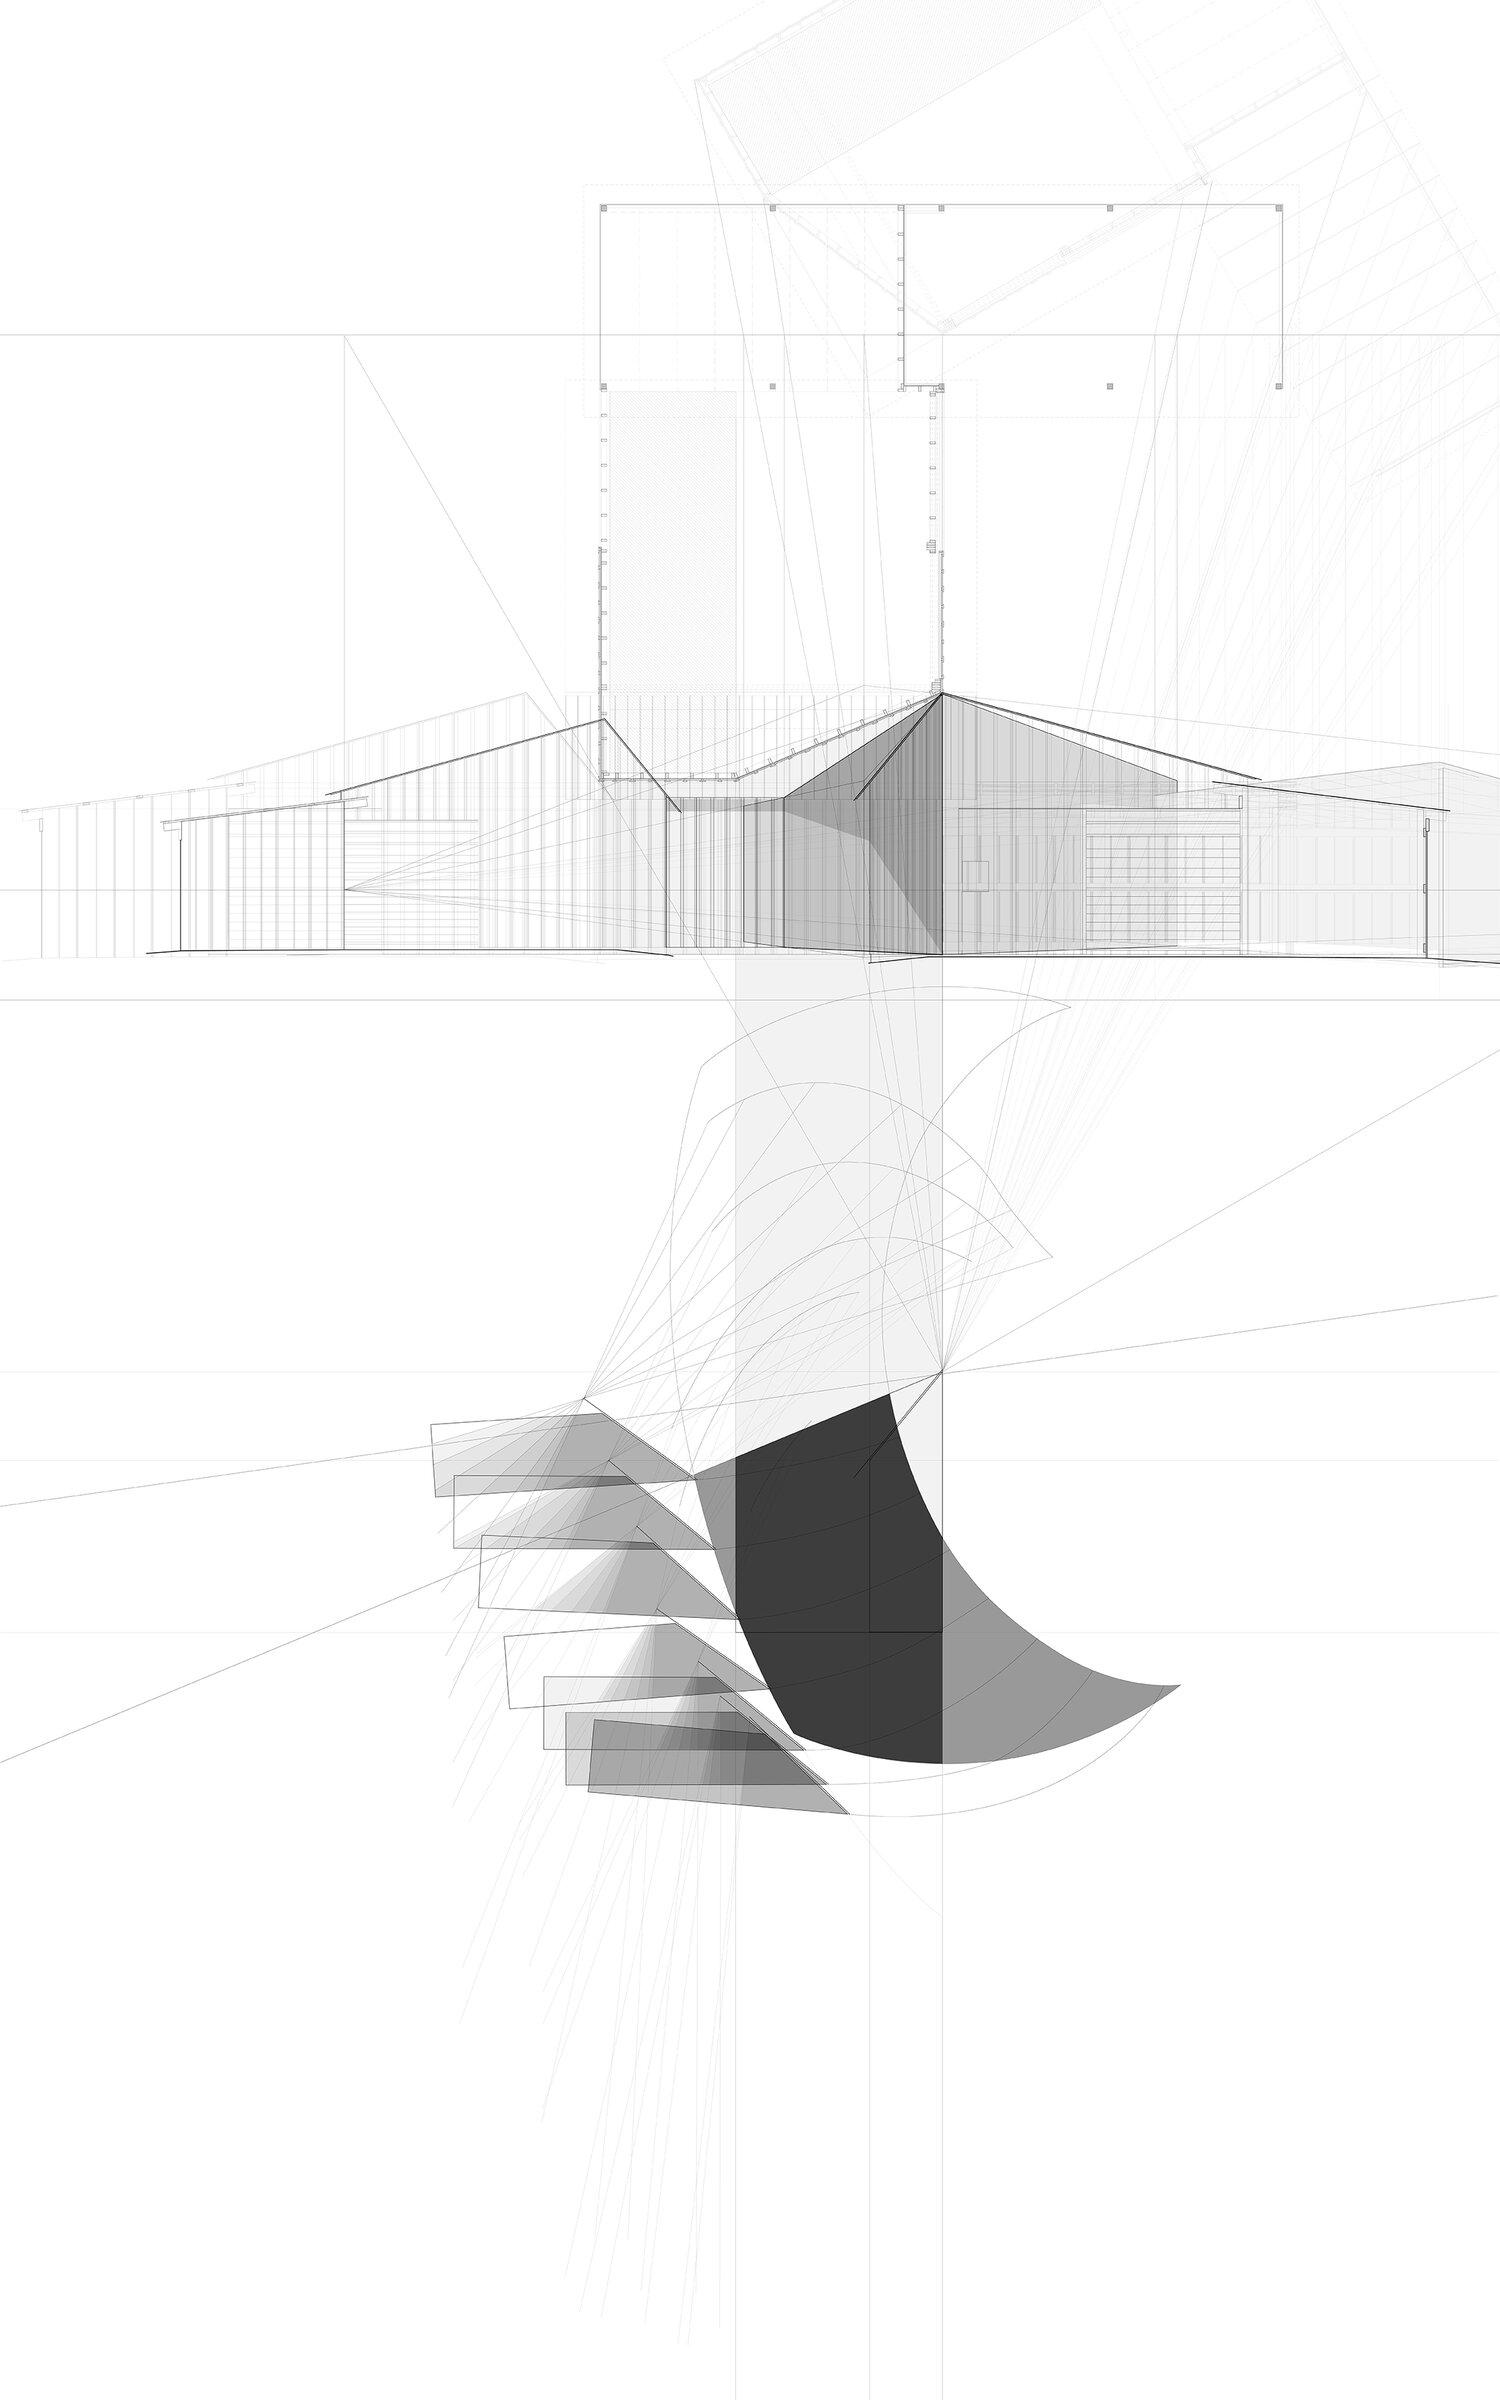 $Composite Drawing Diagram_sm.jpg